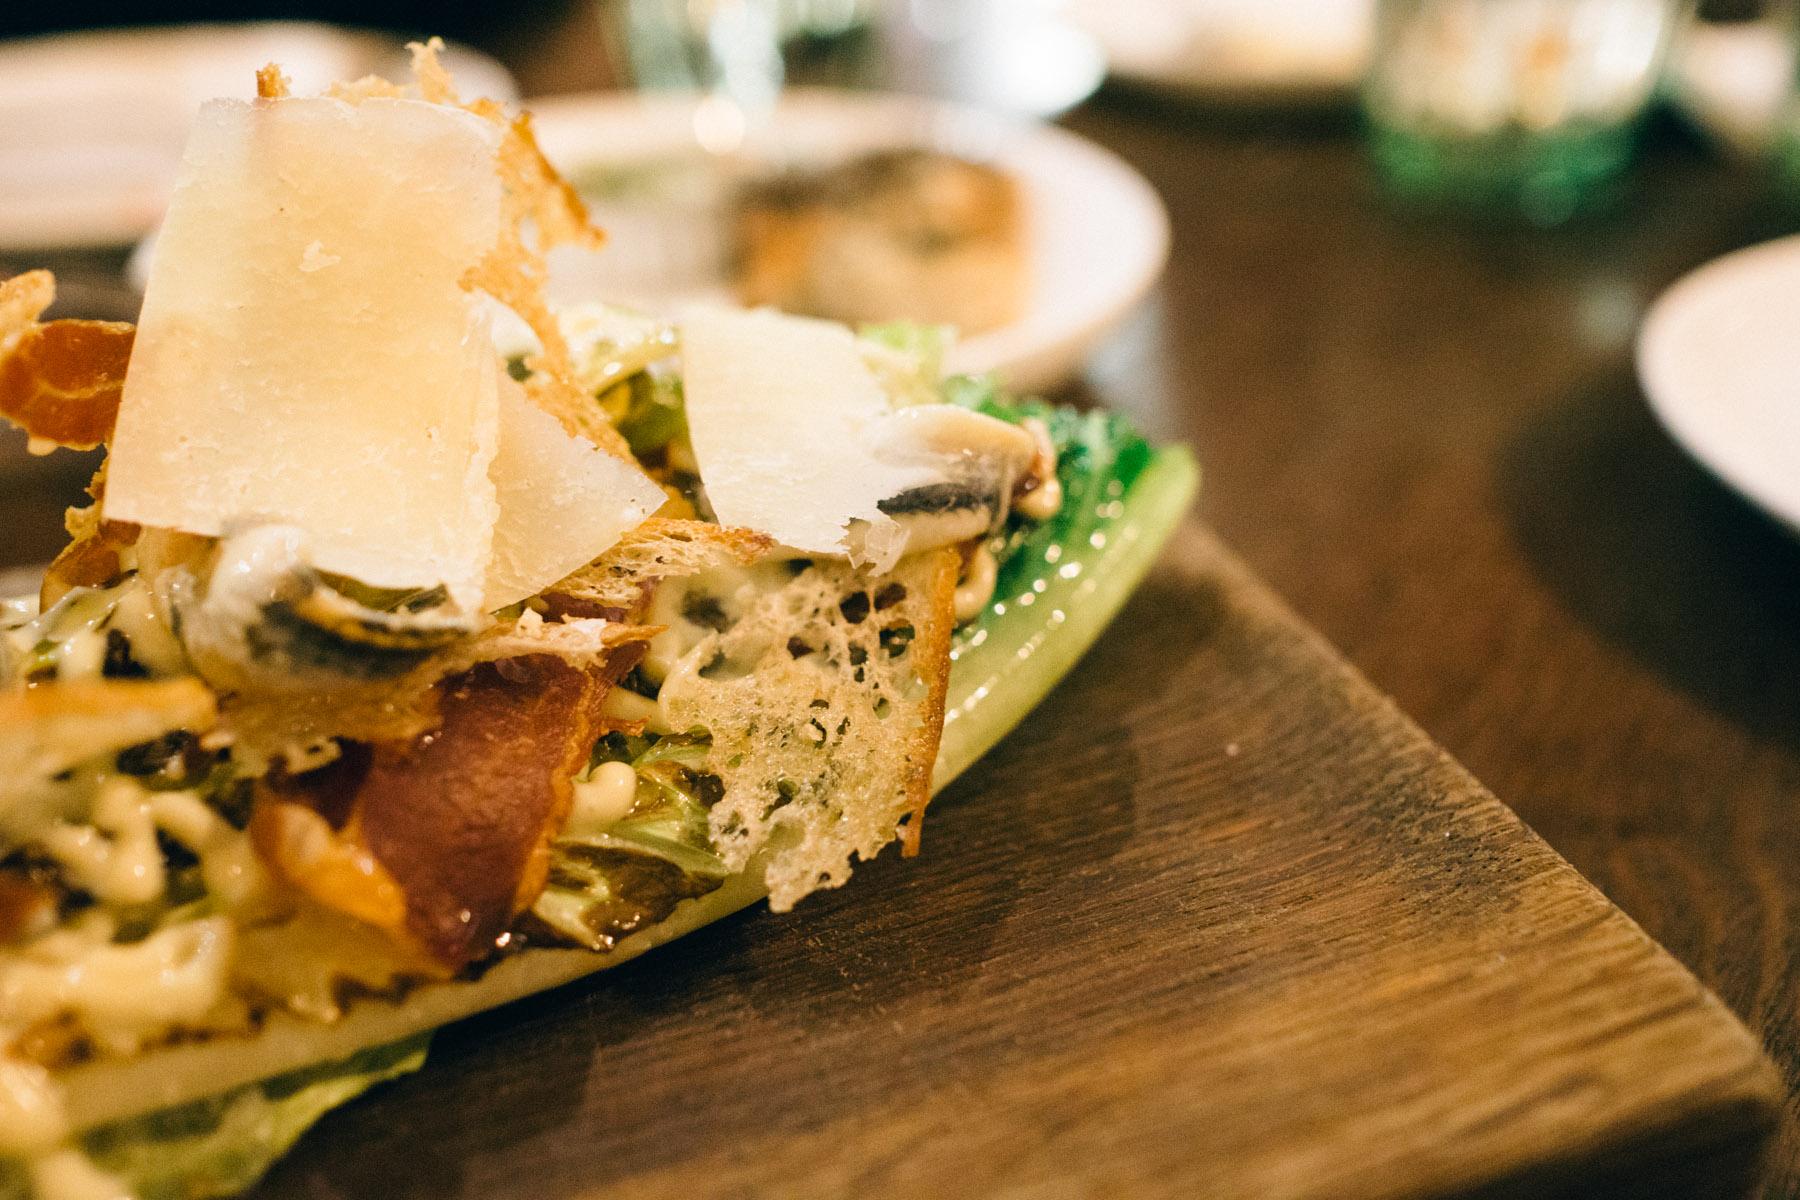 ham-and-sherry-spanish-tapas-ship-street-wan-chai-hong-kong-jason-atherton-17